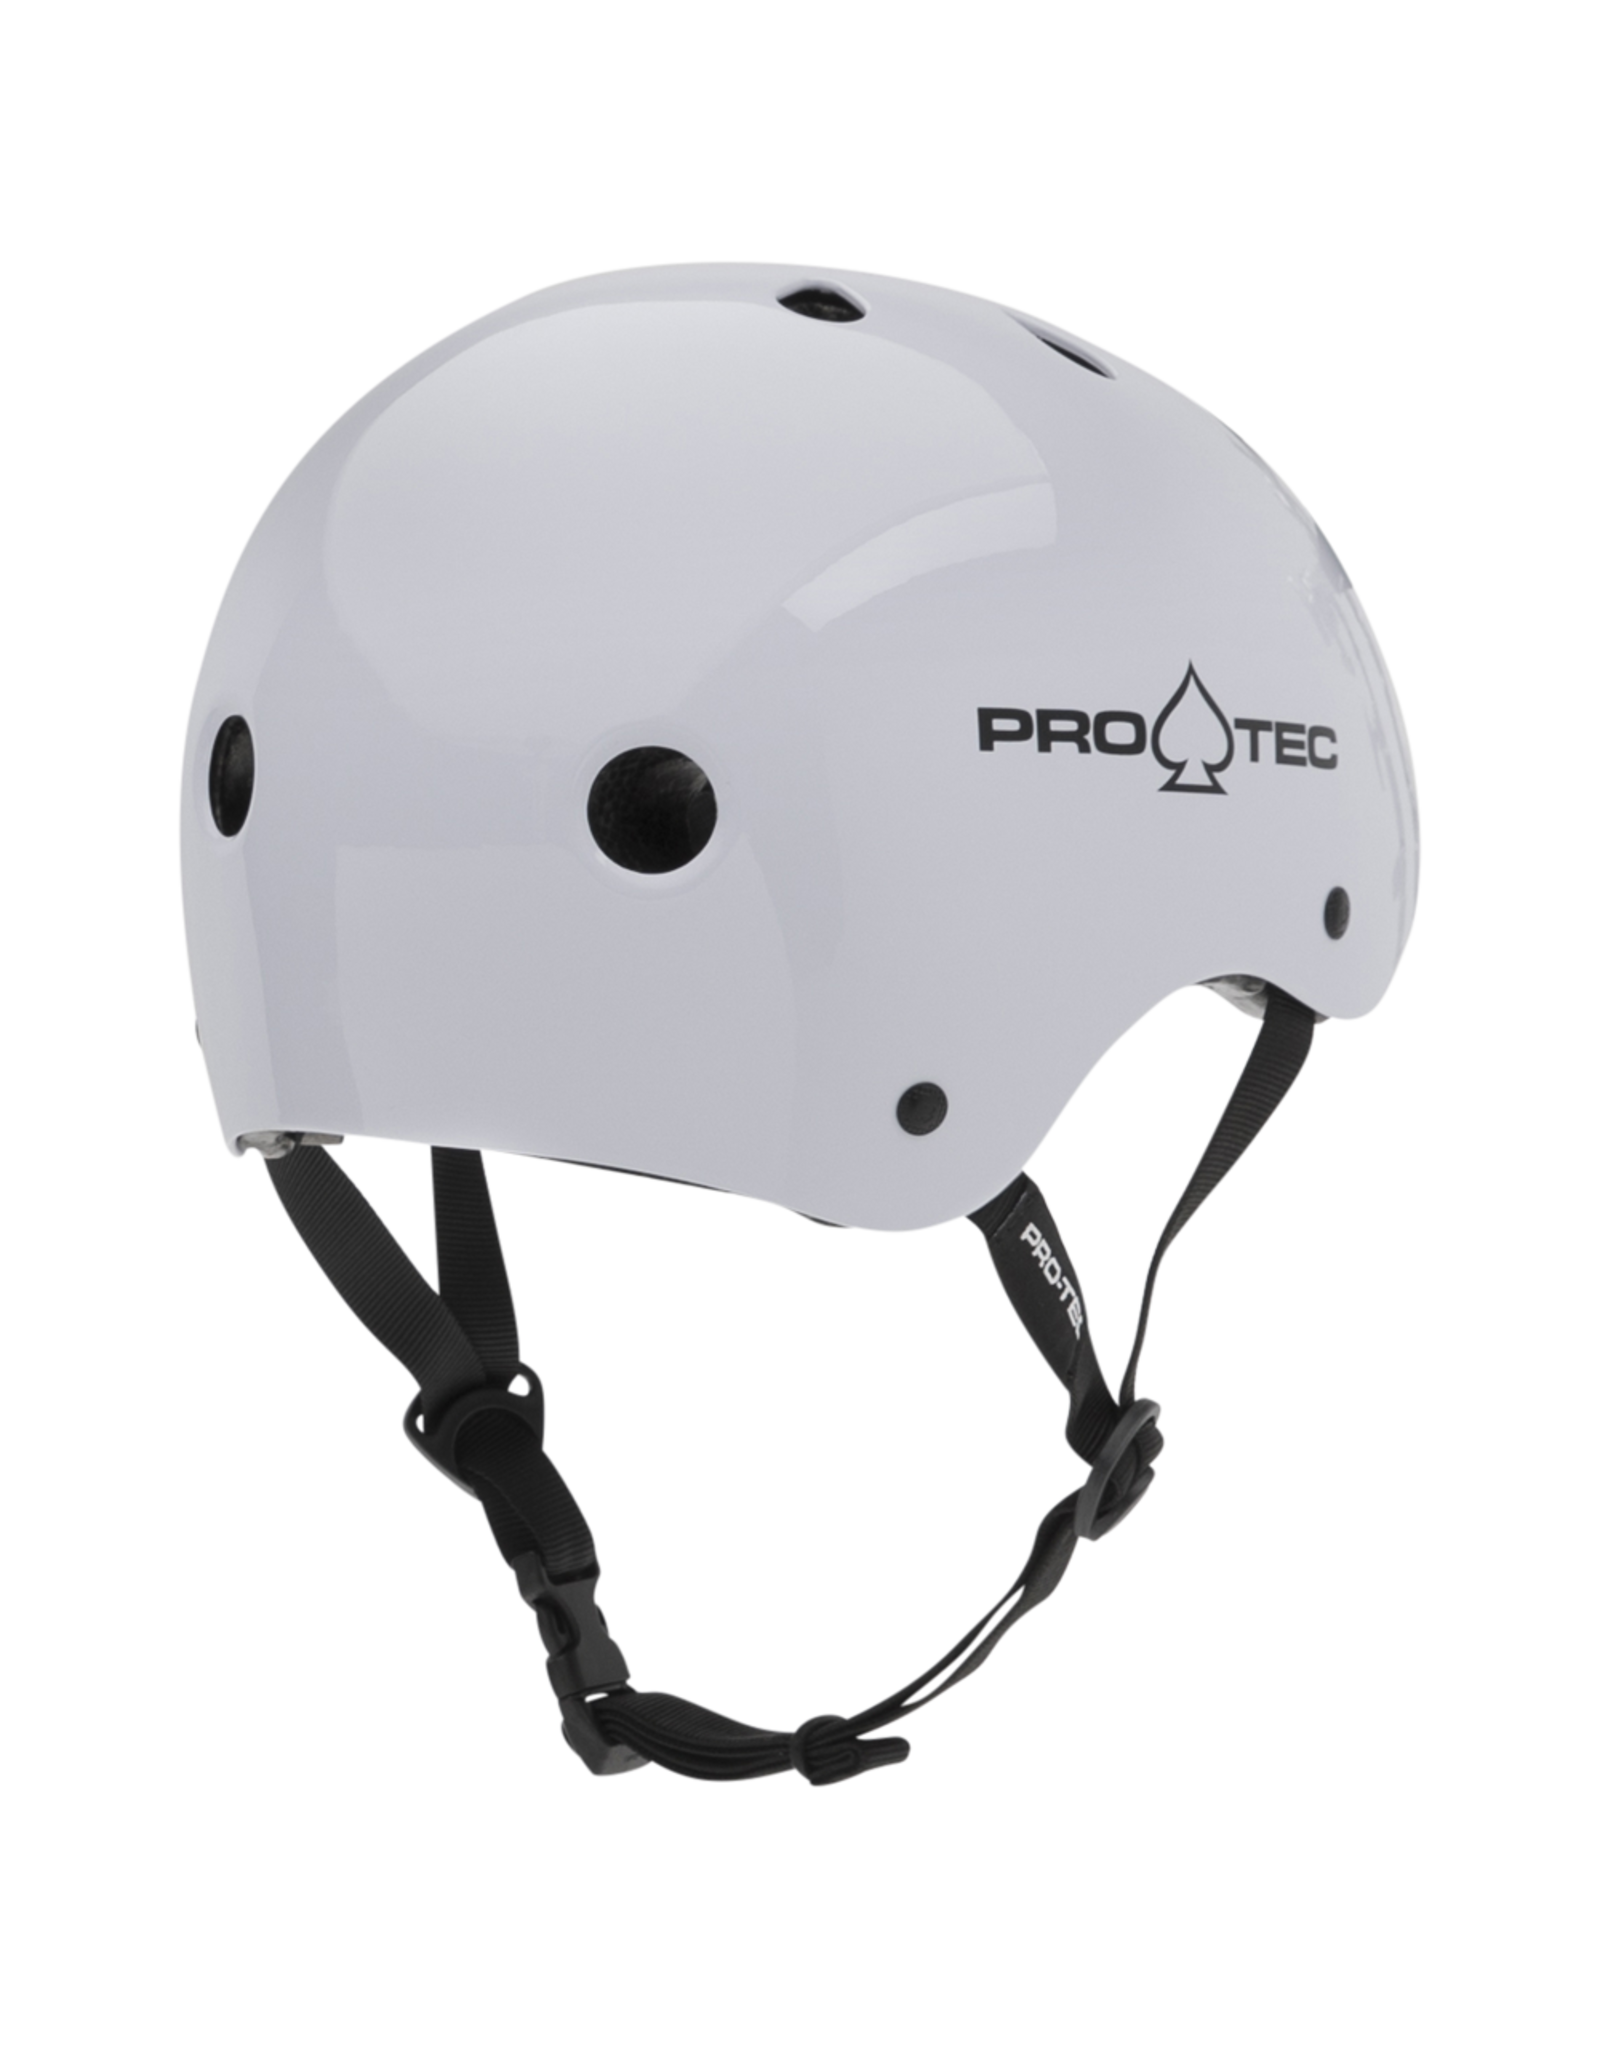 PRO-TEC PRO-TEC - CLASSIC CERT. - GLOSS WHITE-